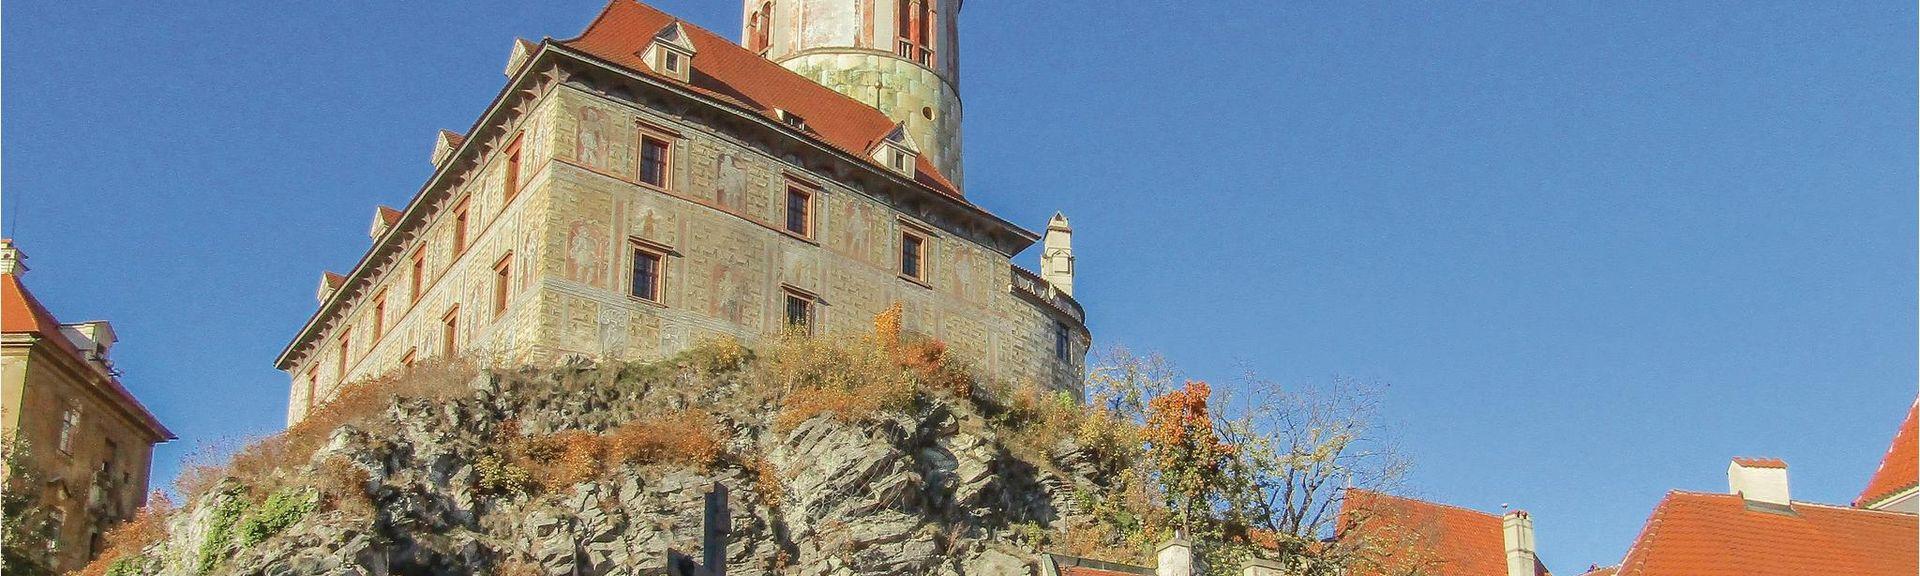 Black Tower, Ceske Budejovice, South Bohemia (region), Czech Republic